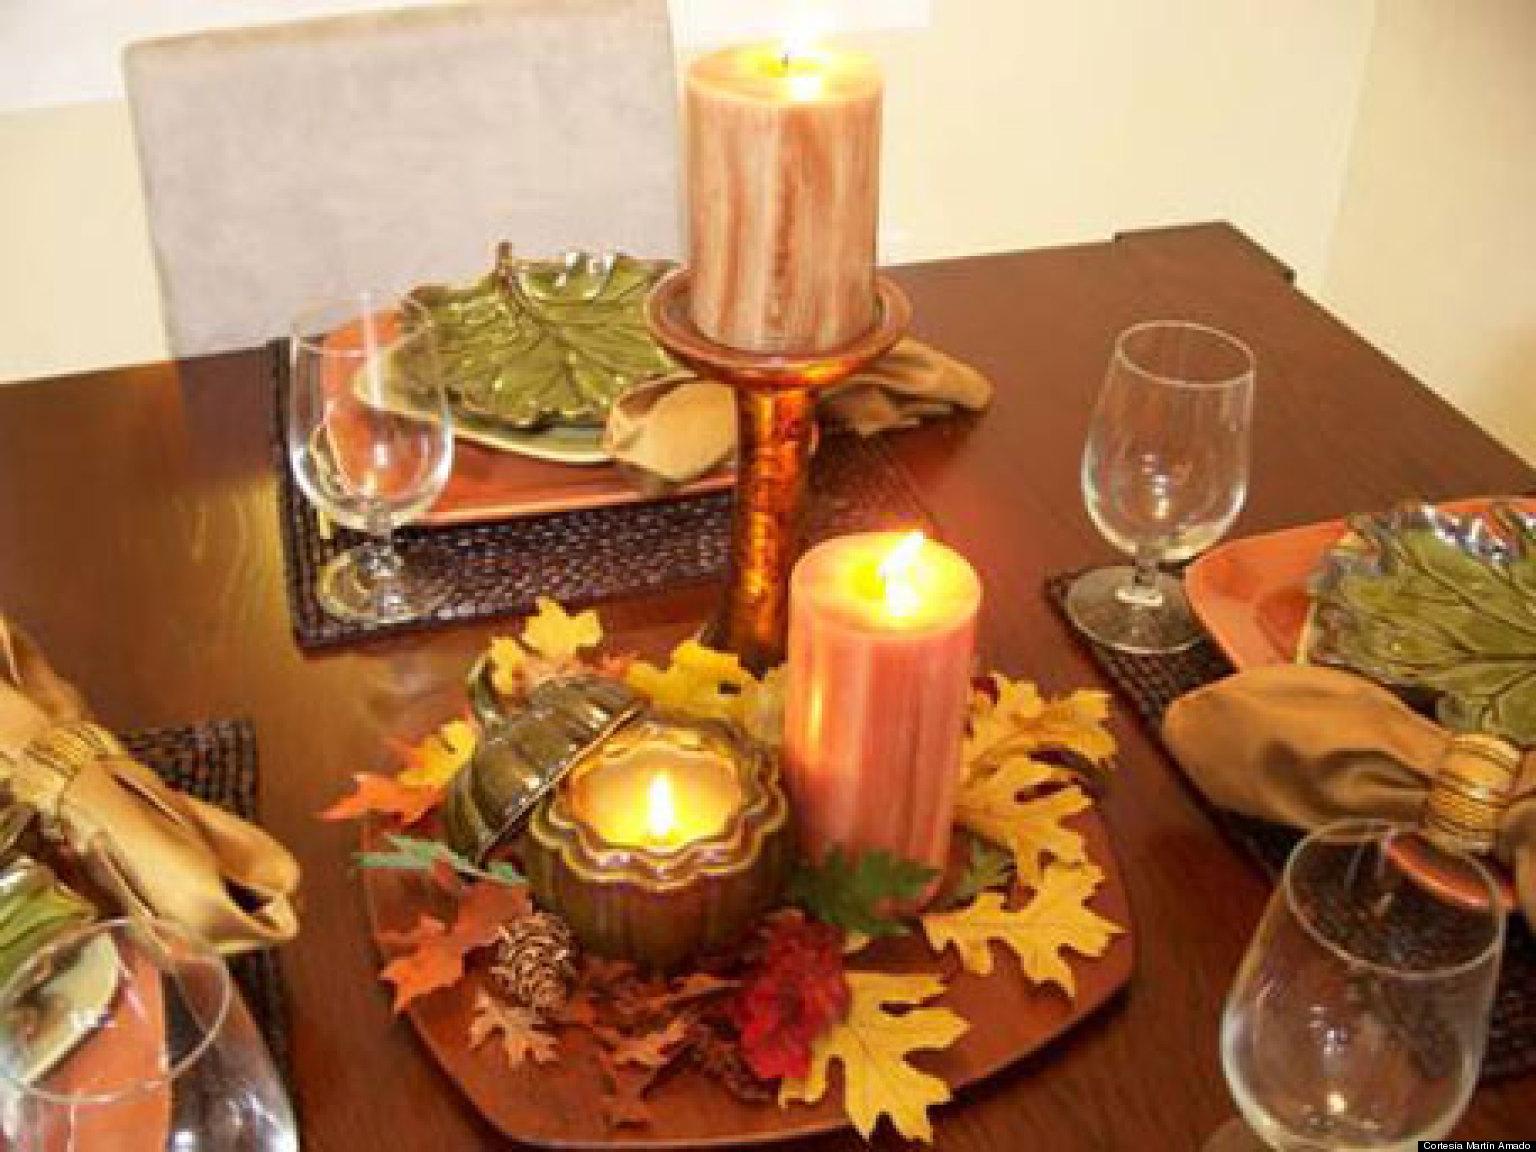 Centro de mesa para la poca de oto o en 5 pasos huffpost for Manualidades rusticas para el hogar